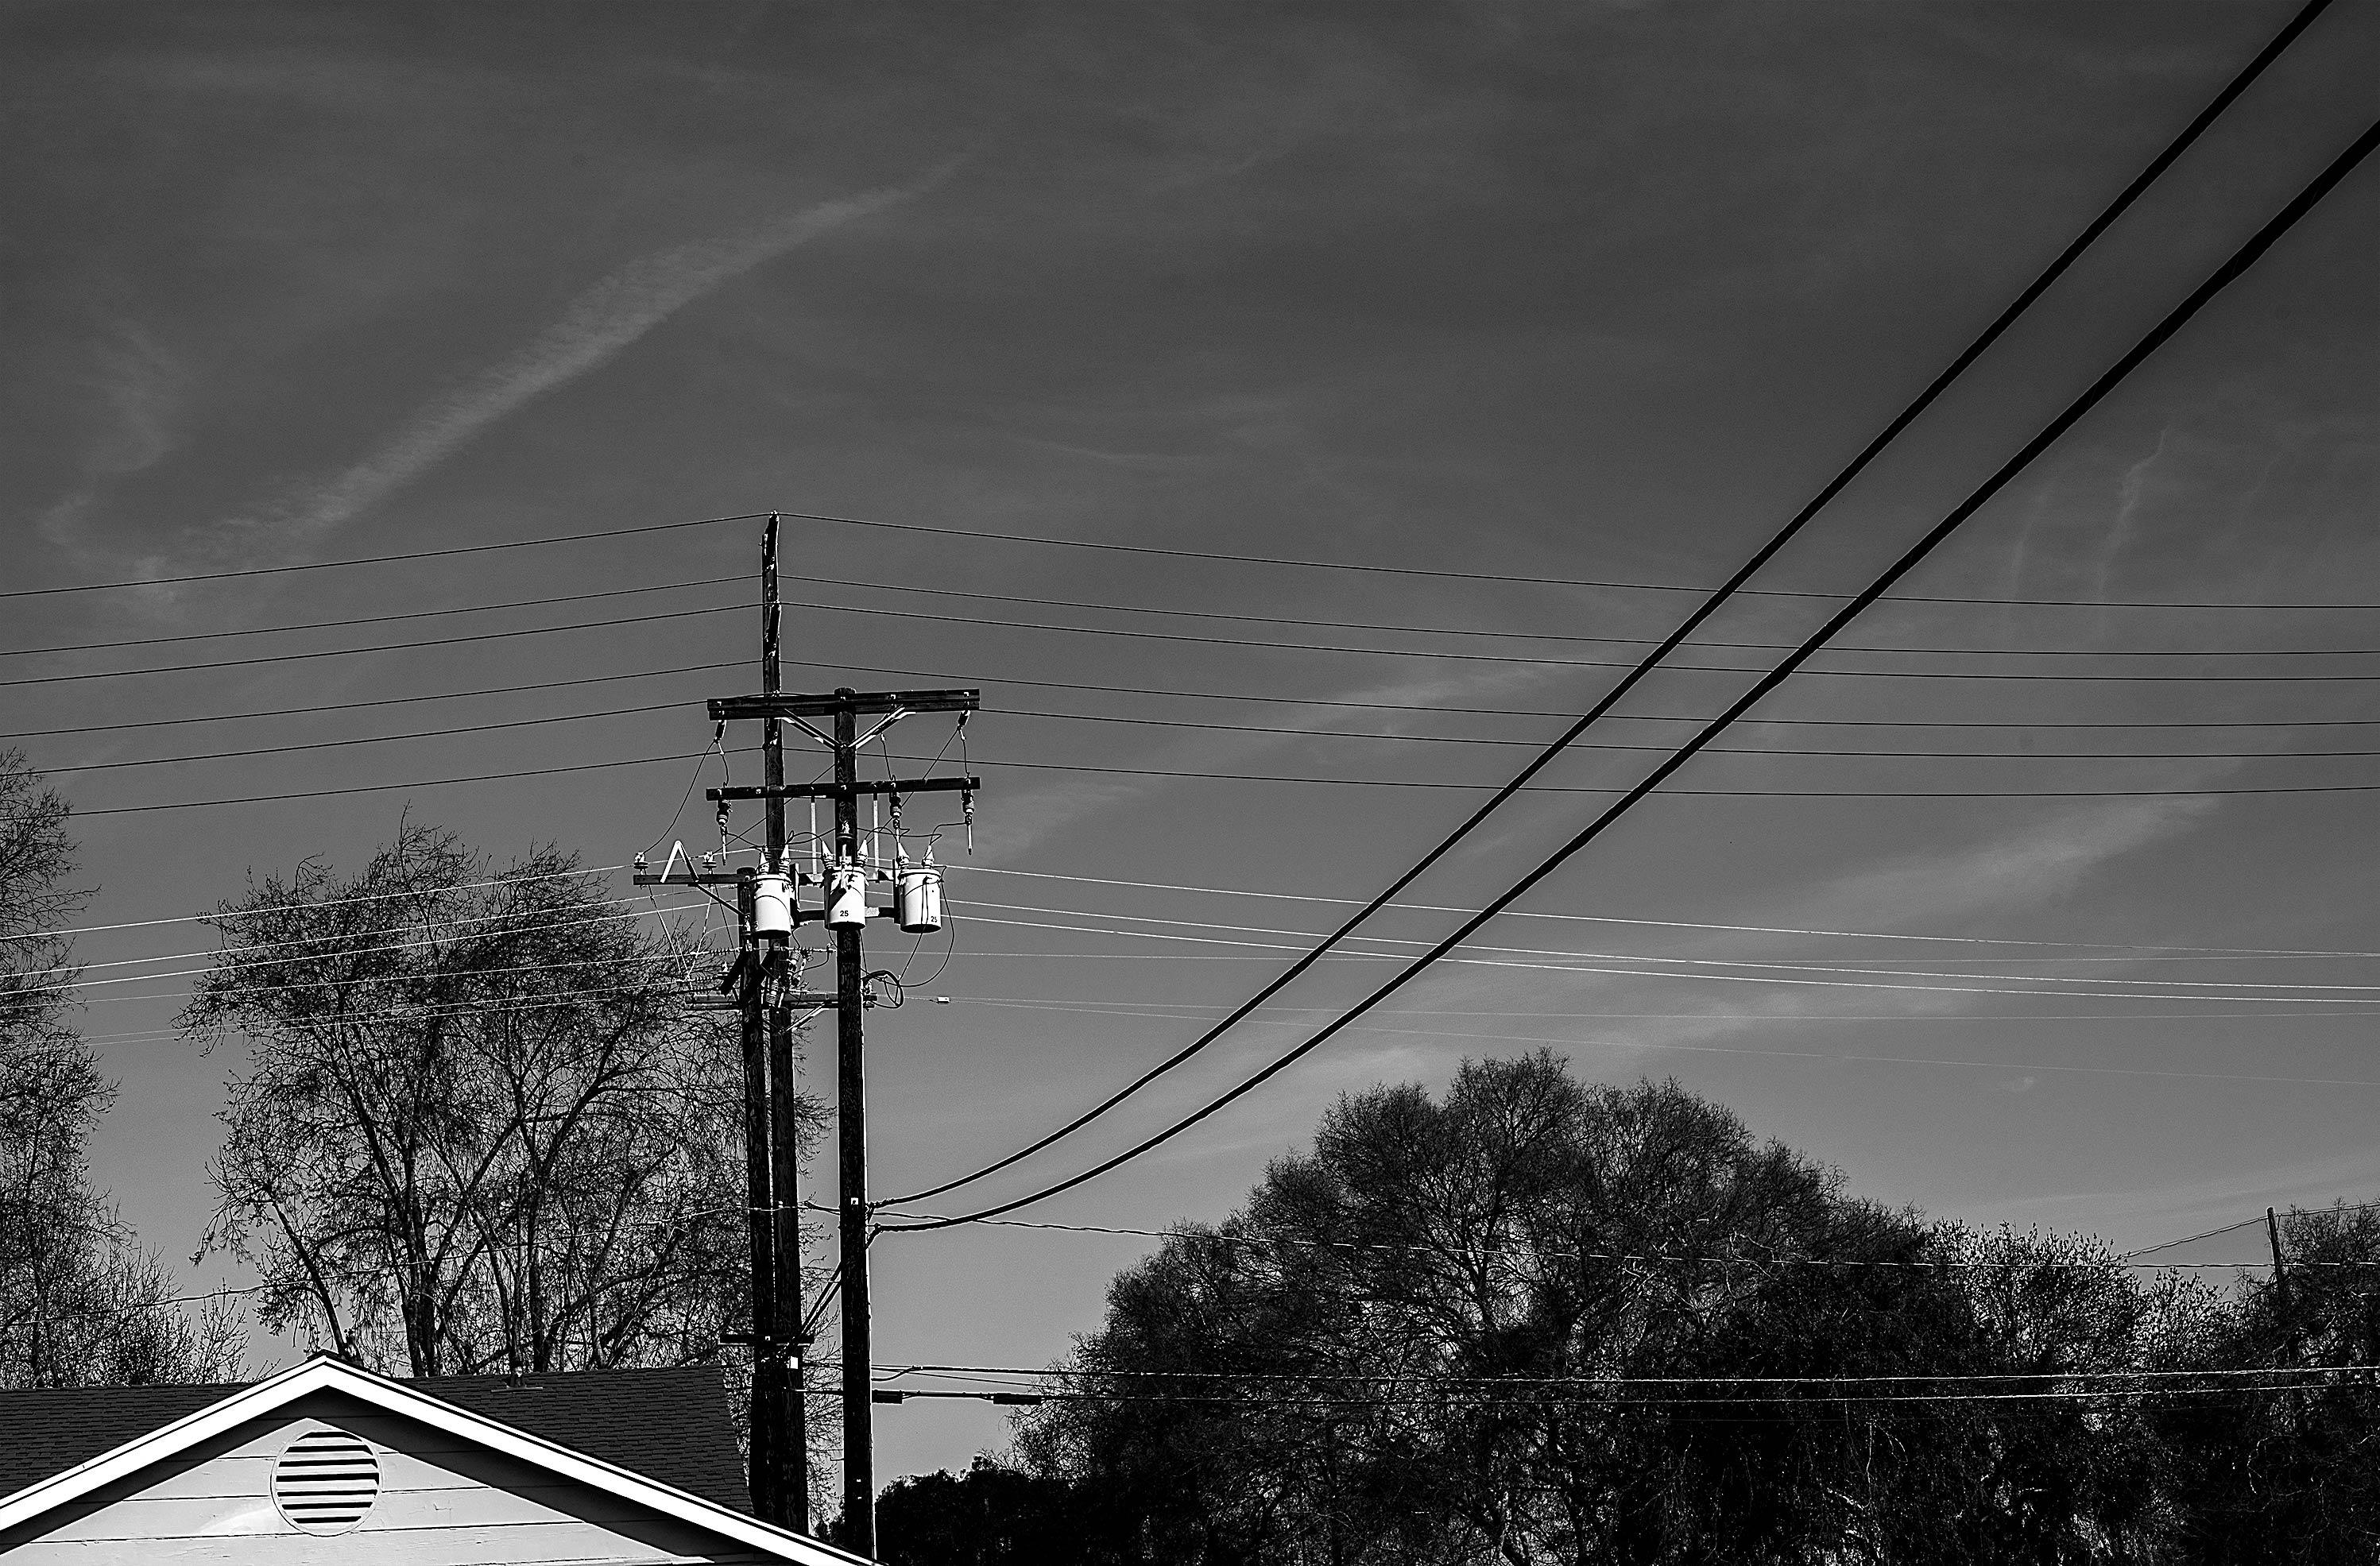 Sfondi Alberi Strada Luce Bianca Monocromo Cielo Nuvole